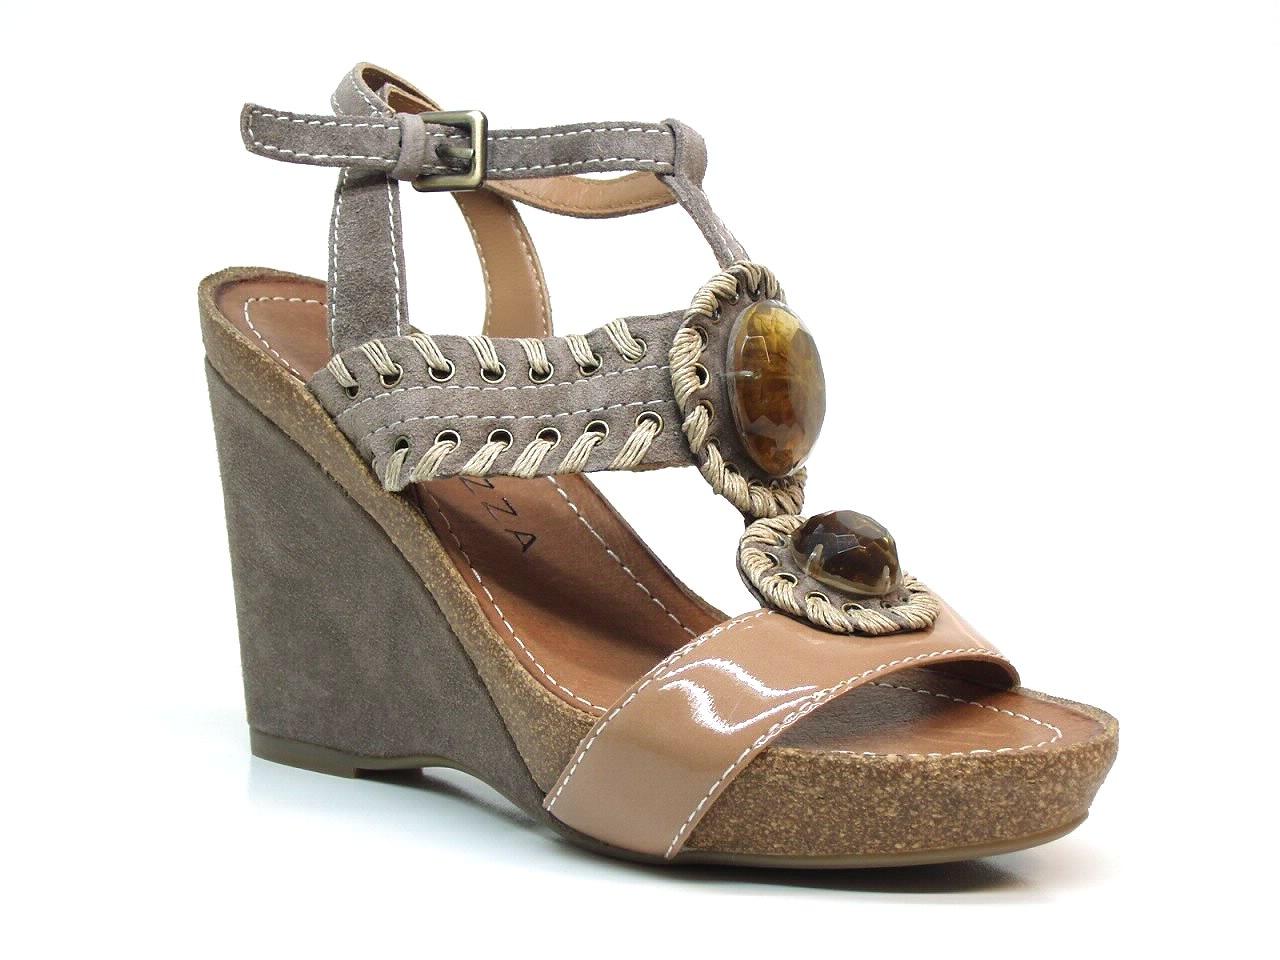 Wedge Outlet Store 460500505Glispe Apepazza Sandals WDYEHI2e9